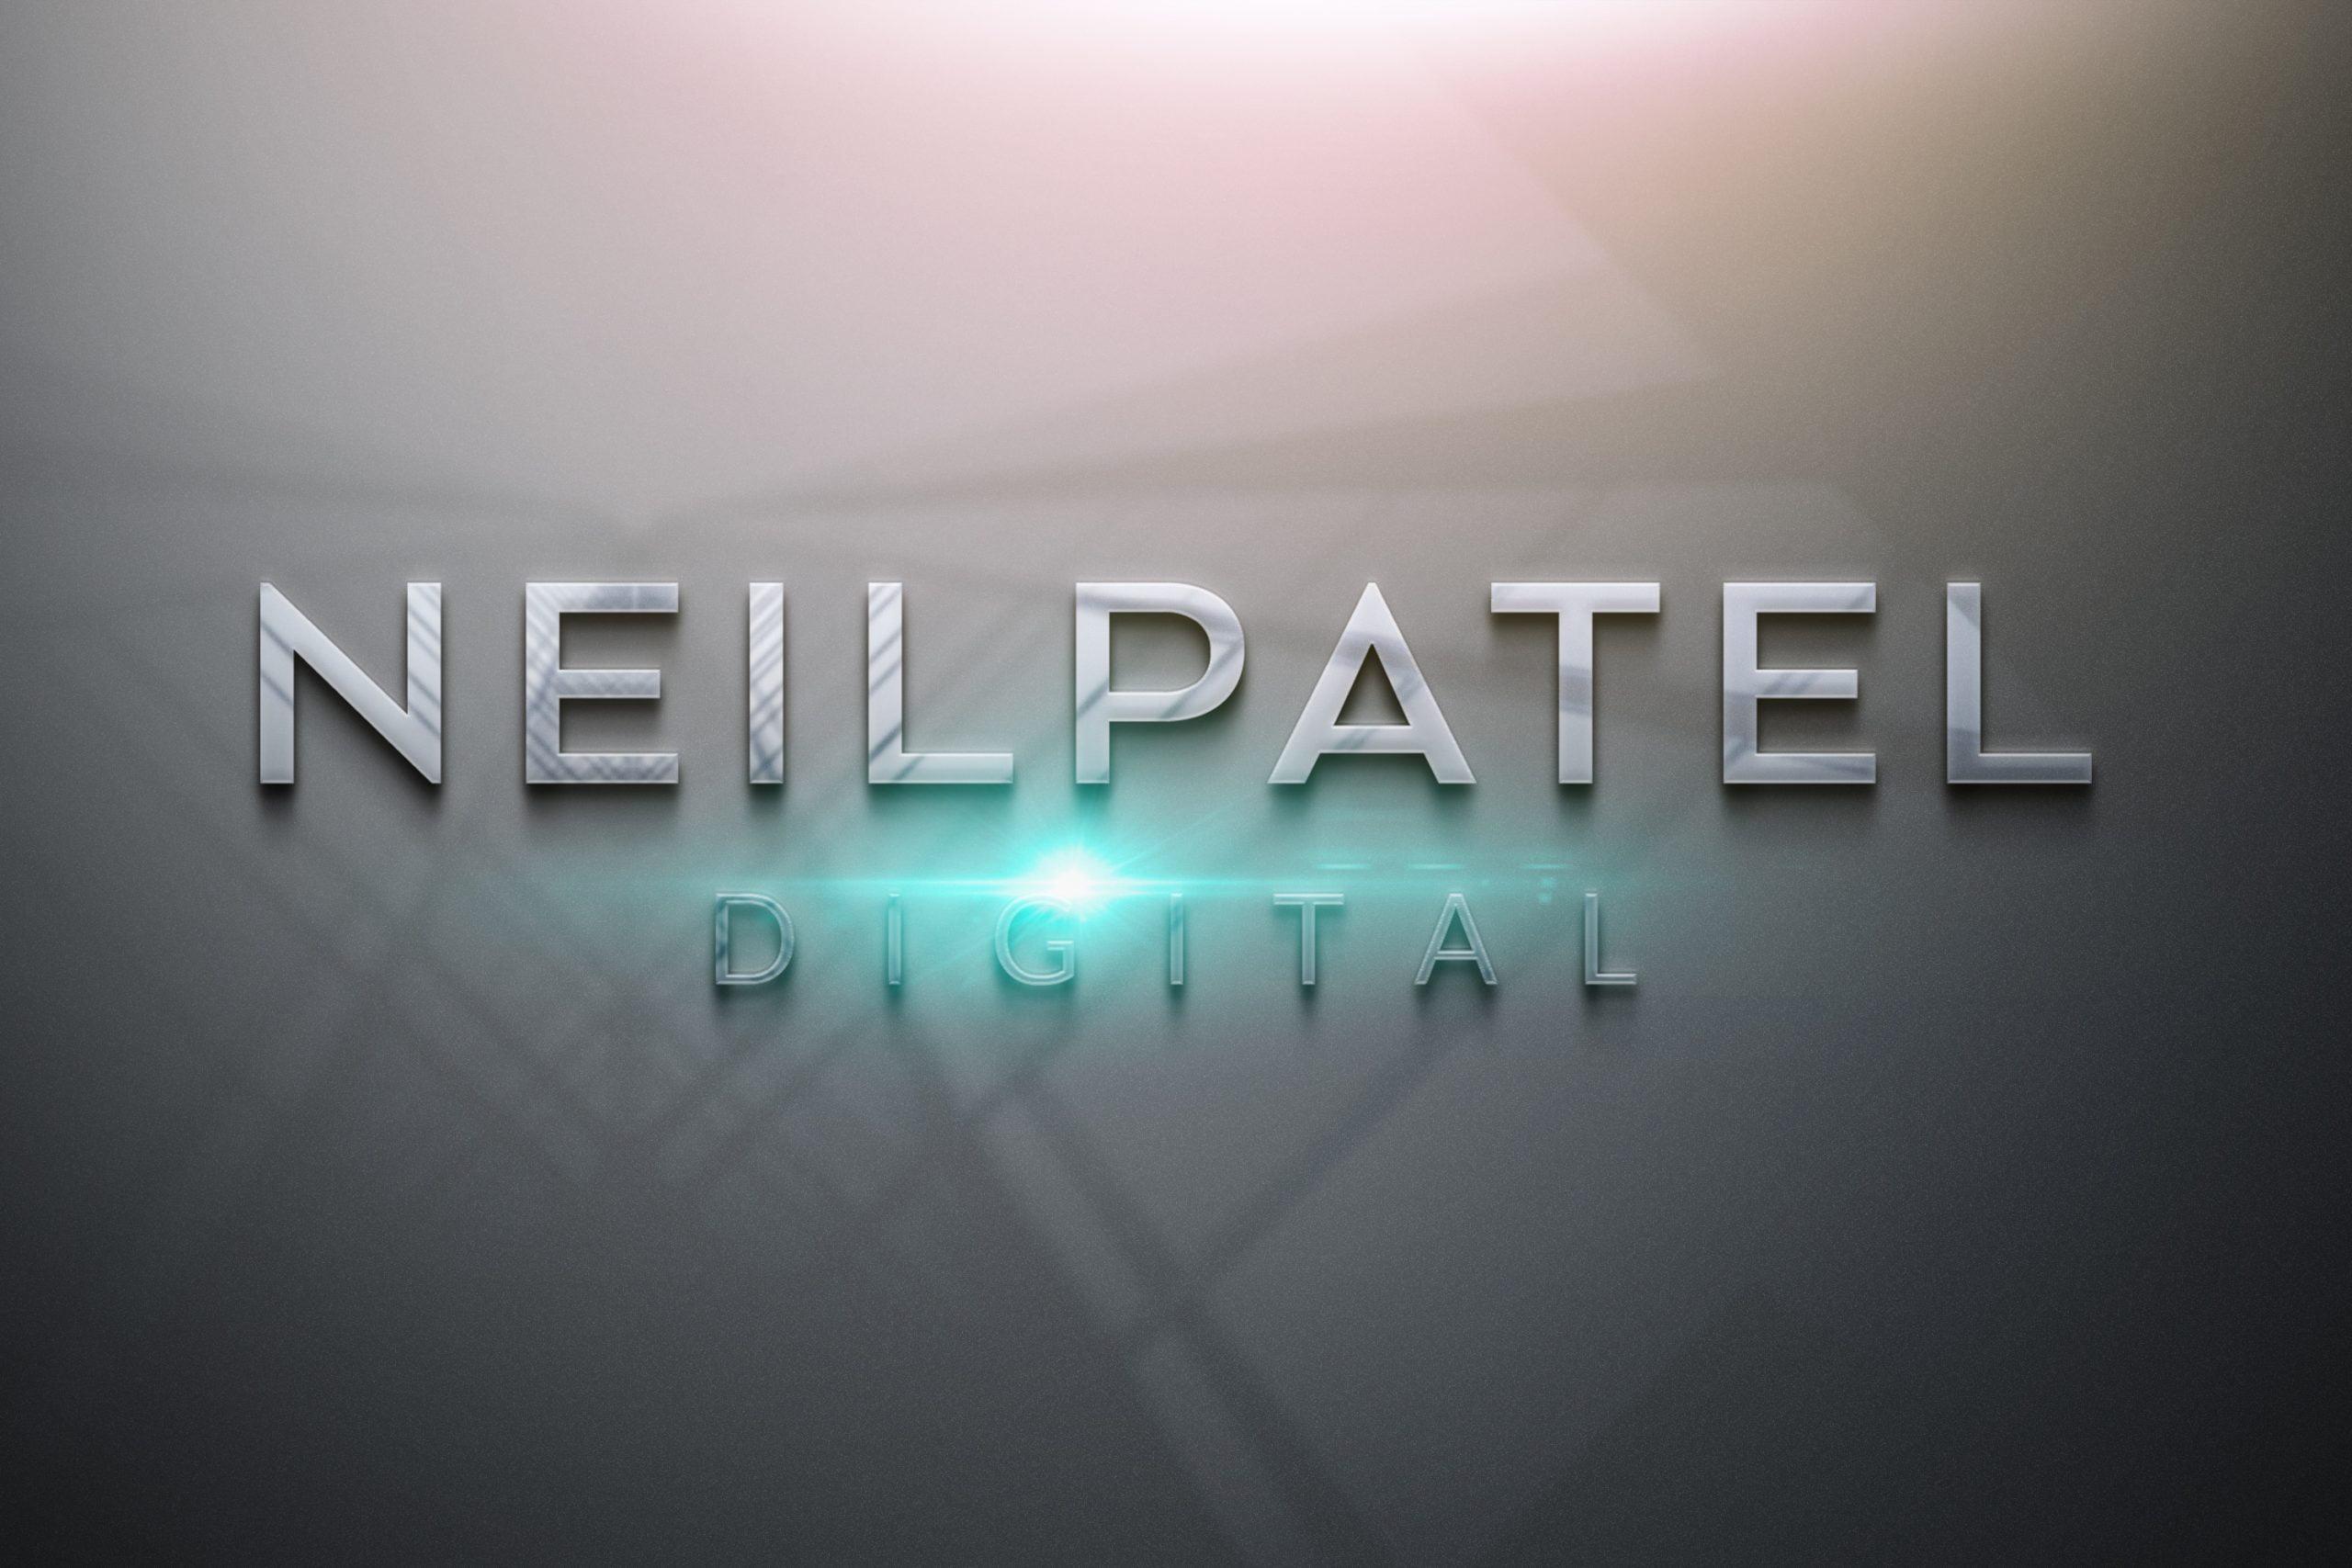 Neil-patel-Free-Photoshop-Glossy-3D-Logo-Mockup